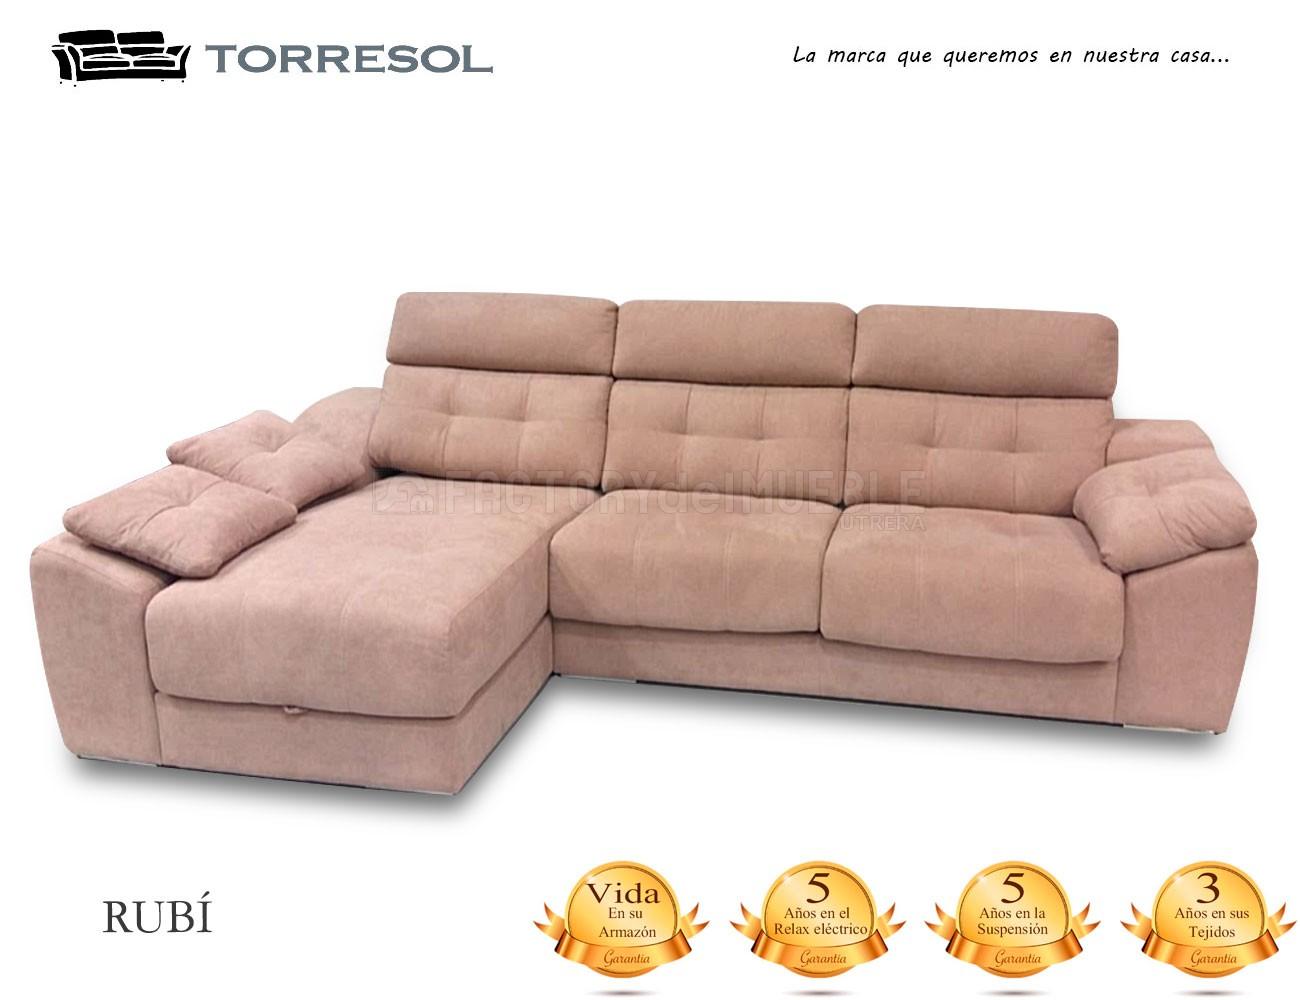 Sofa rubi torresol 1